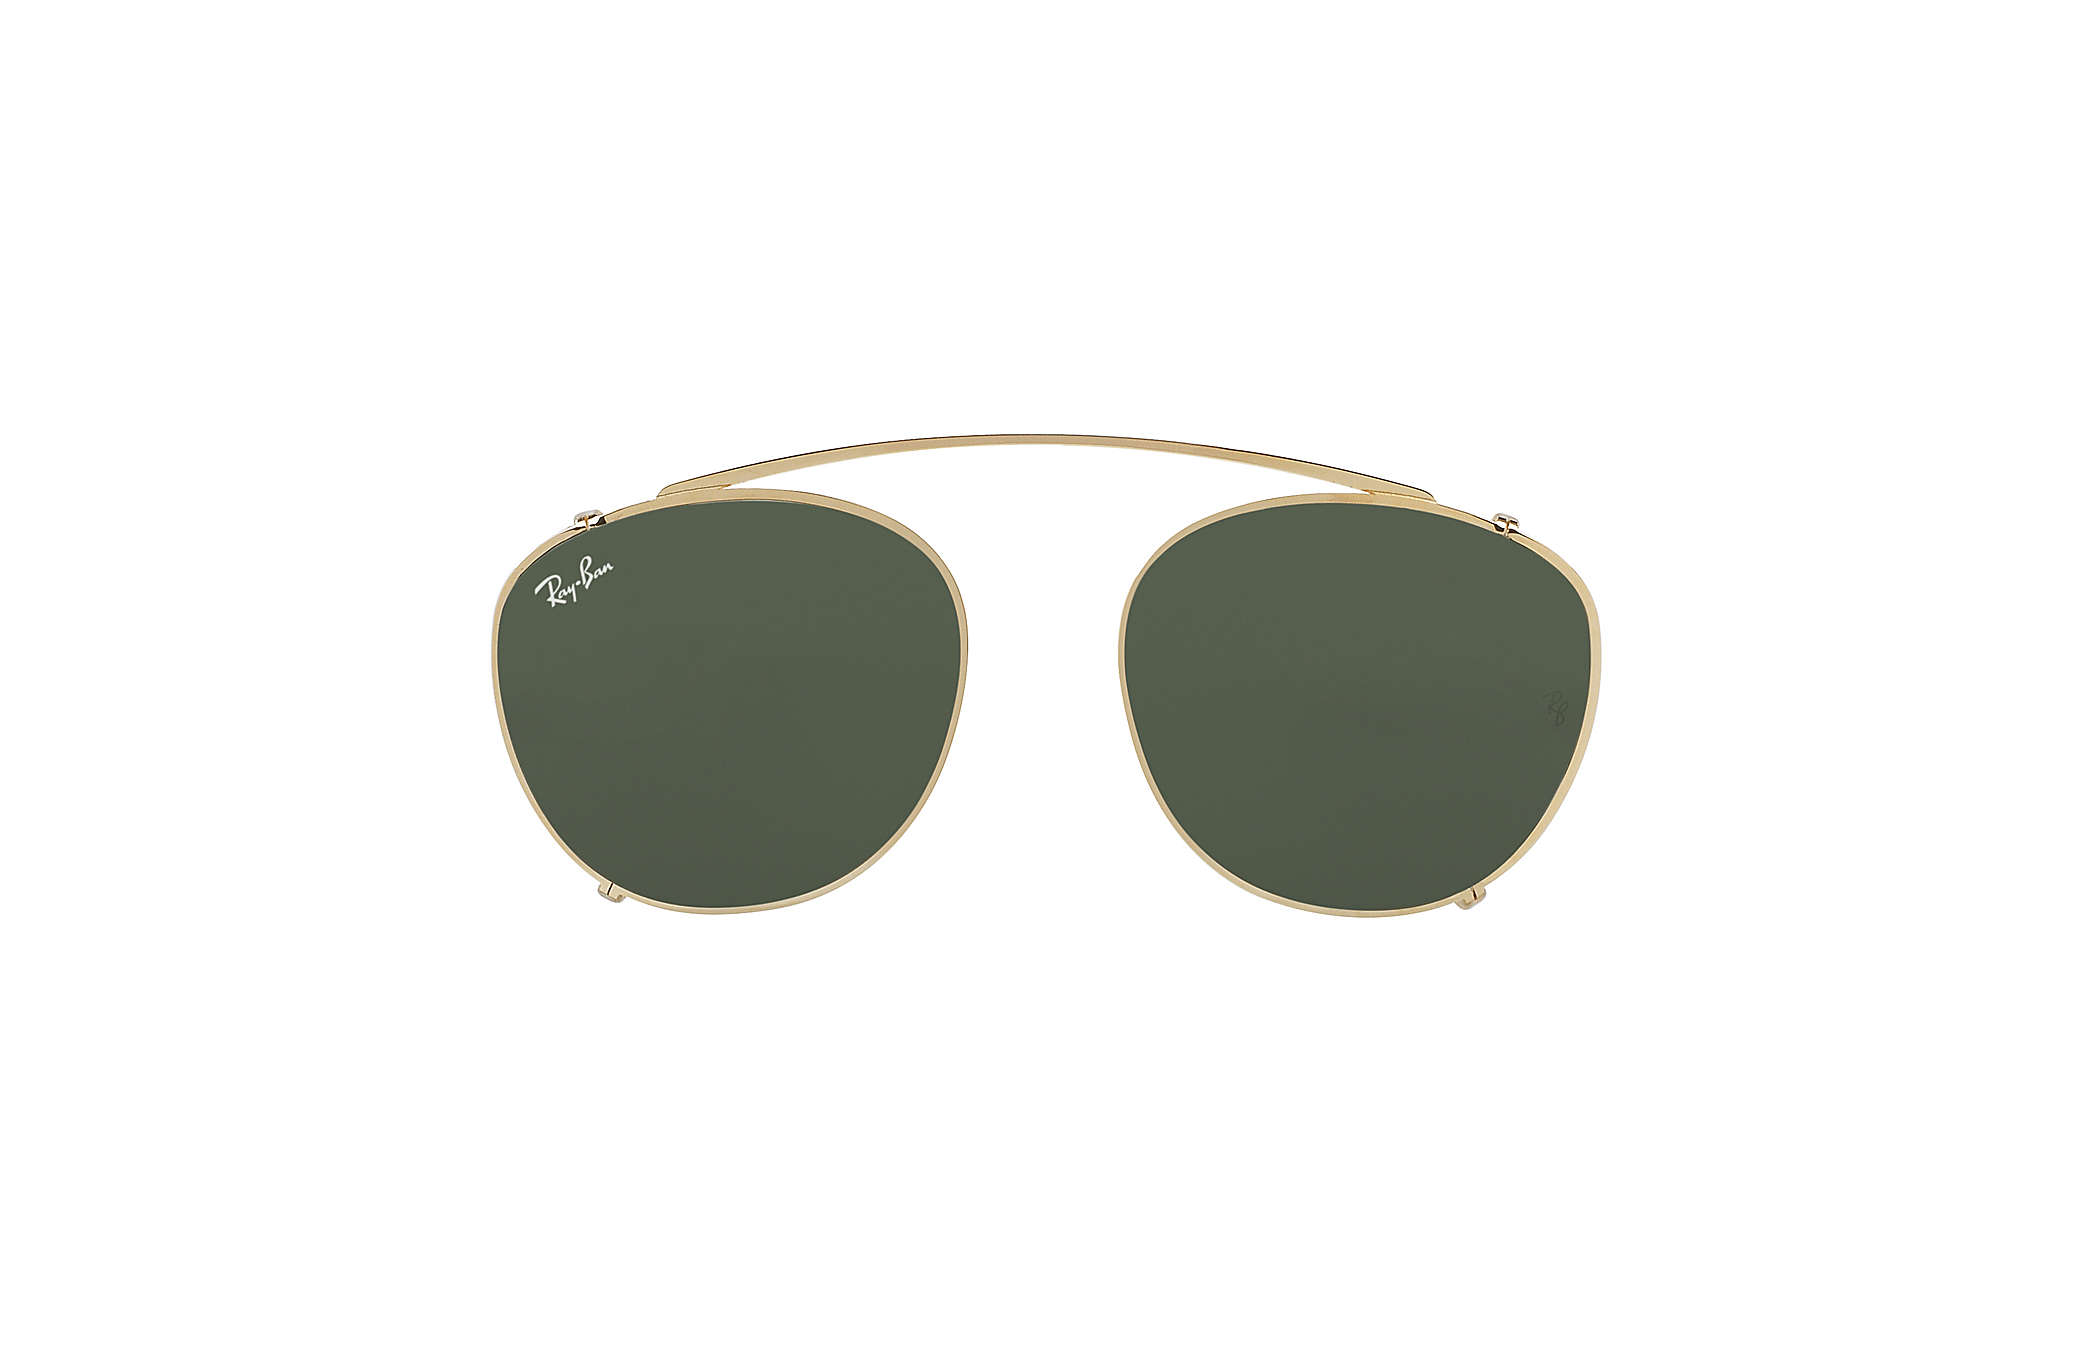 7b13ebc943 Ray-Ban prescription glasses RB6355 Black - Liteforce ...